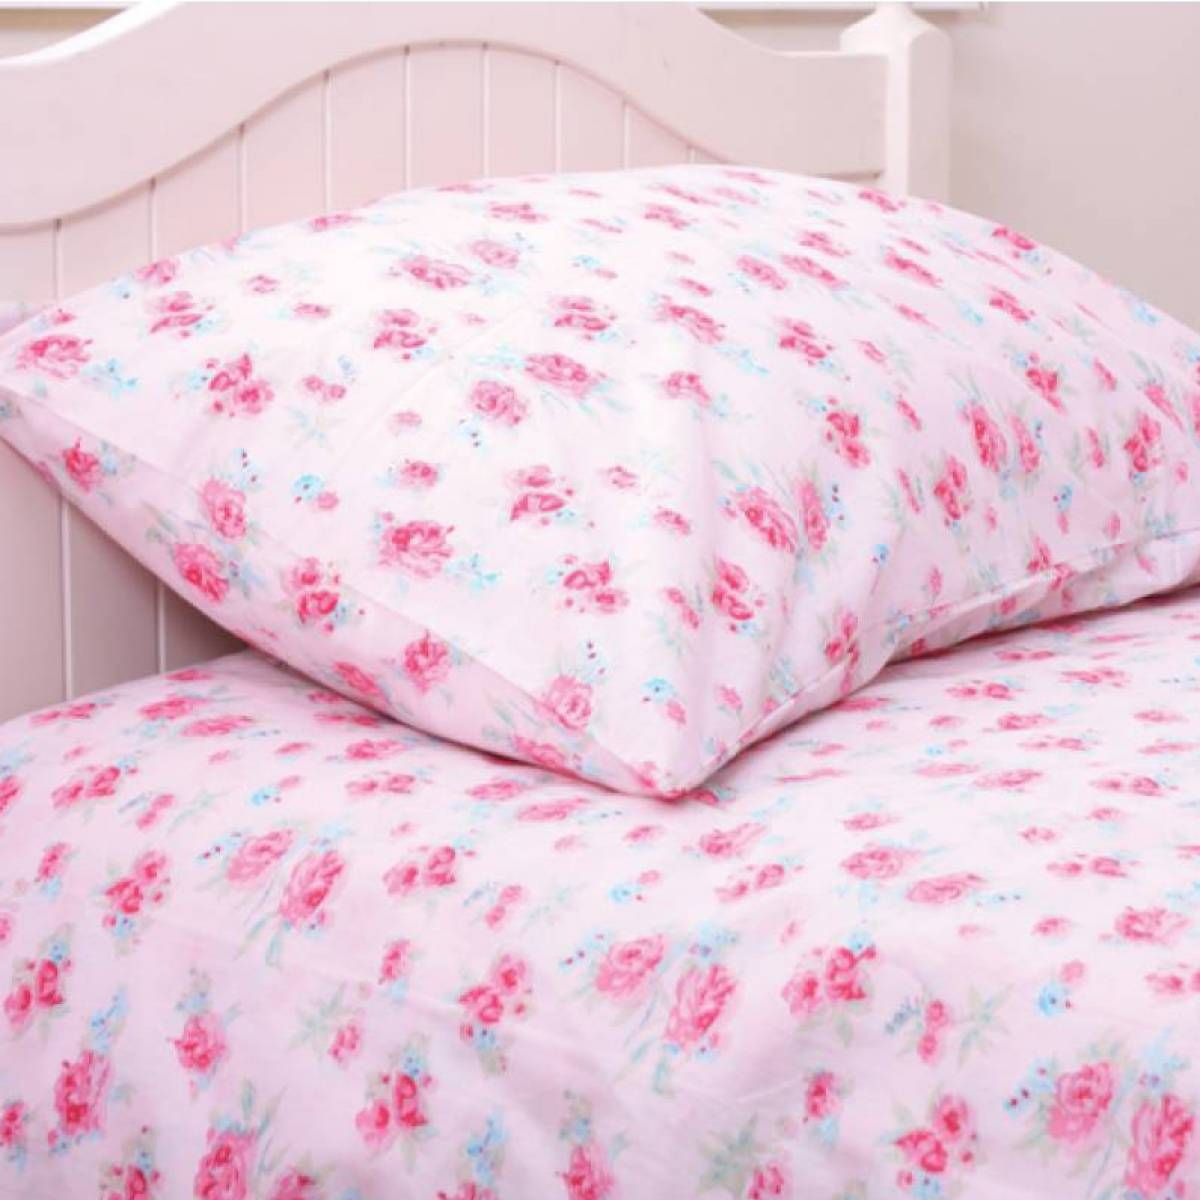 Baby girl cot bed bedding sets - Girls Rosie Cot Bed Duvet Set Http Www Babyface Uk